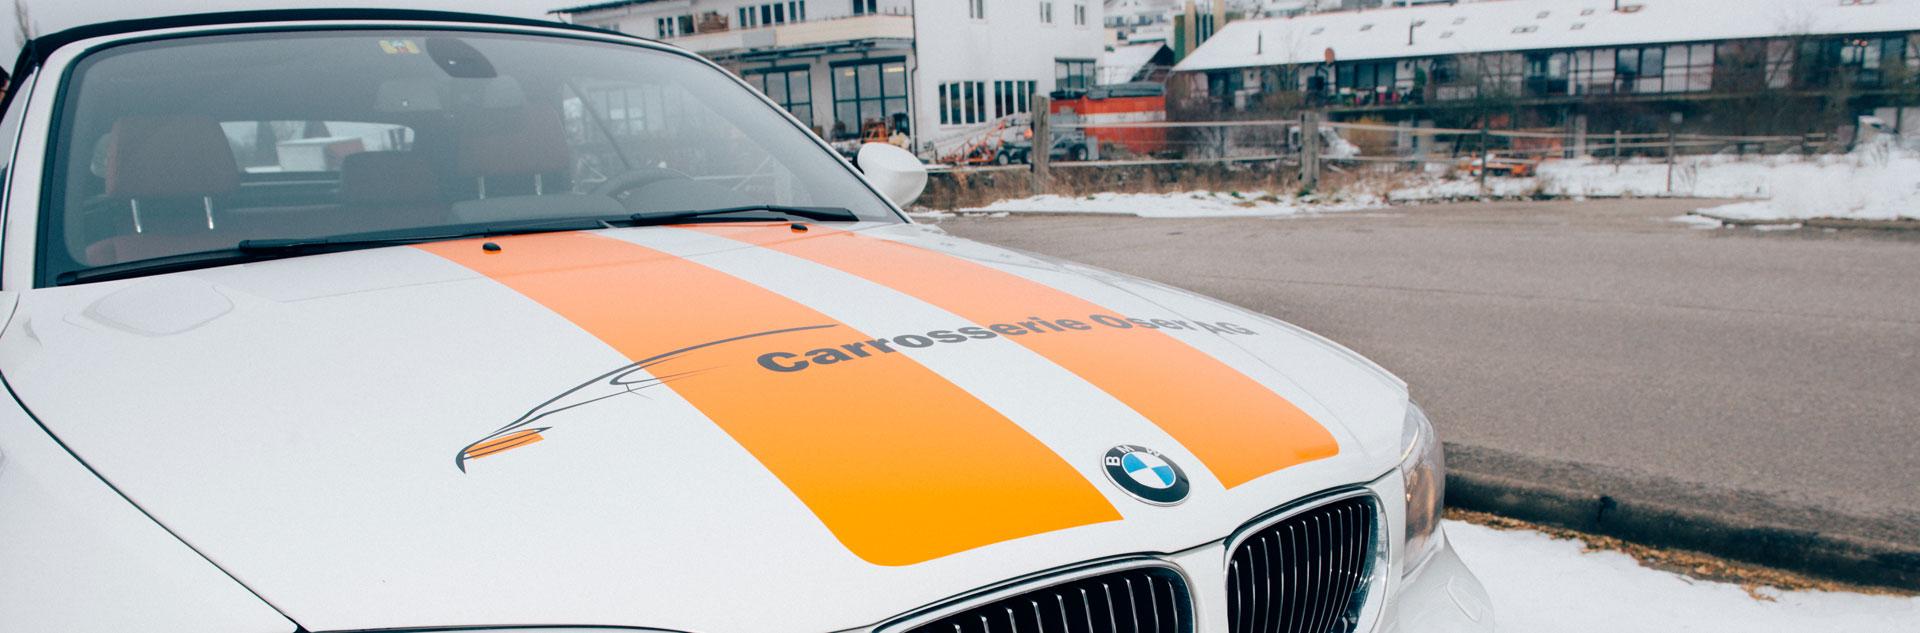 Slider Carrosserie Oser Arisdorf Ersatzwagen